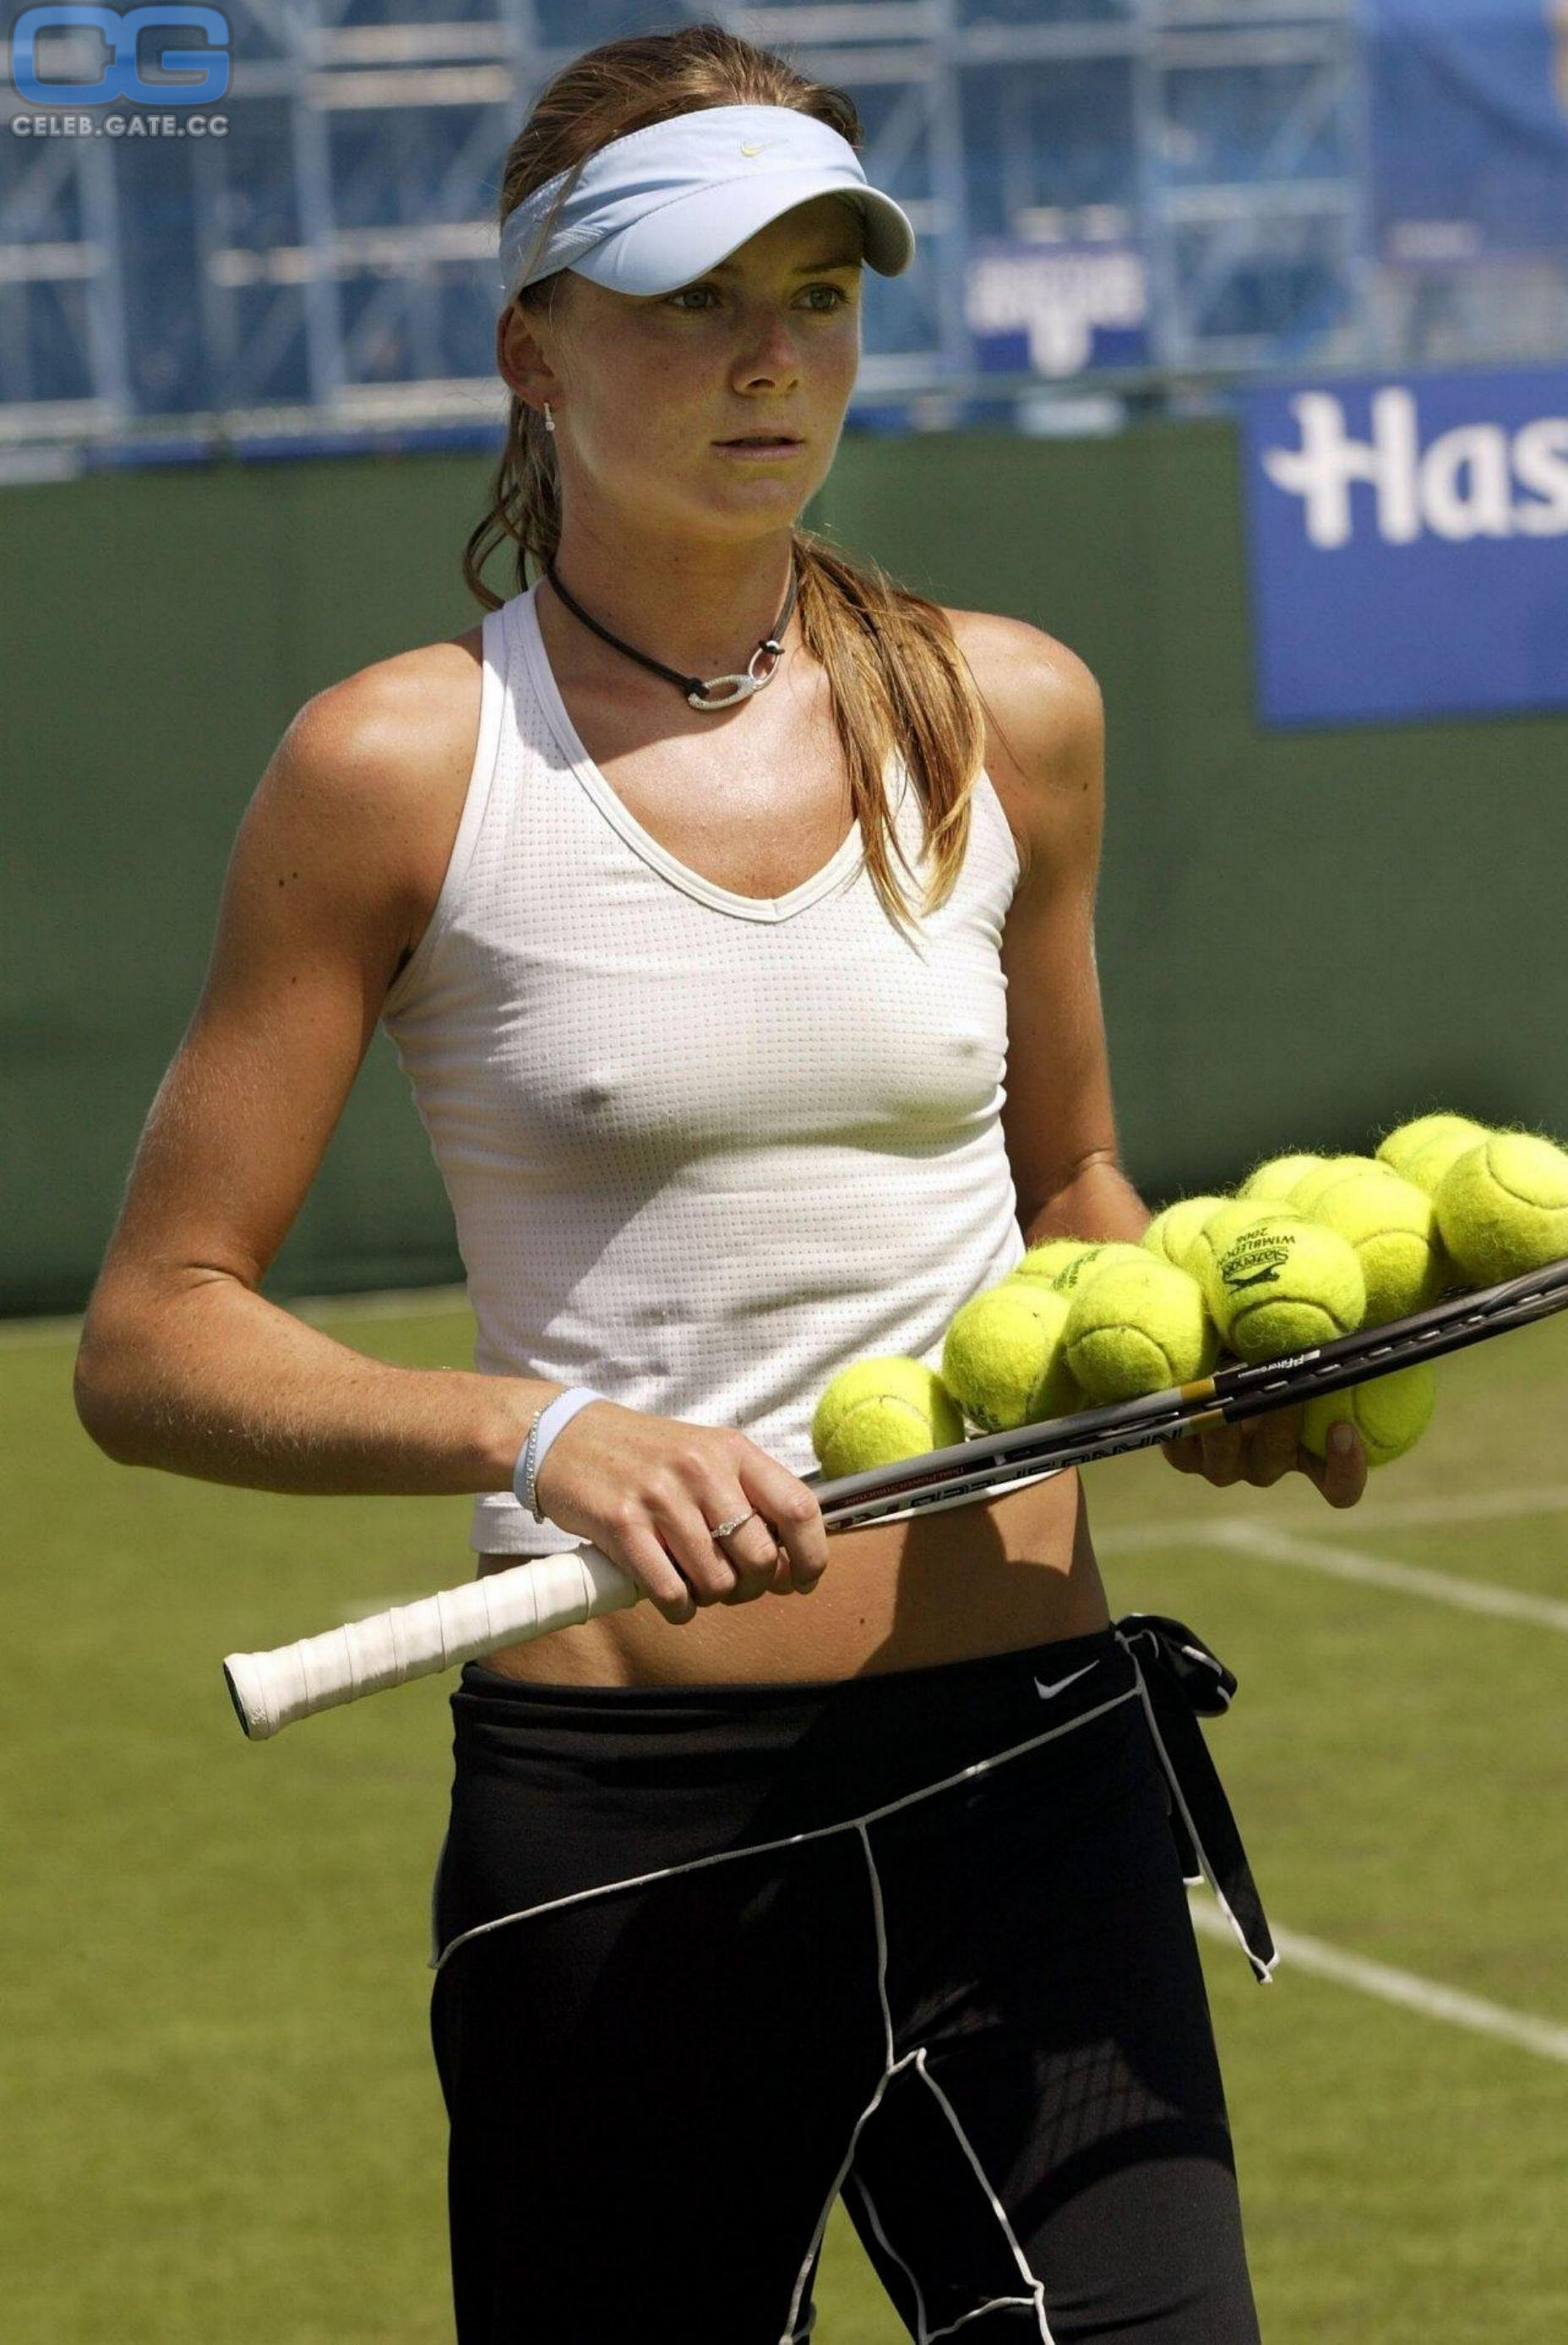 Nude daniela hantuchova Tennis player